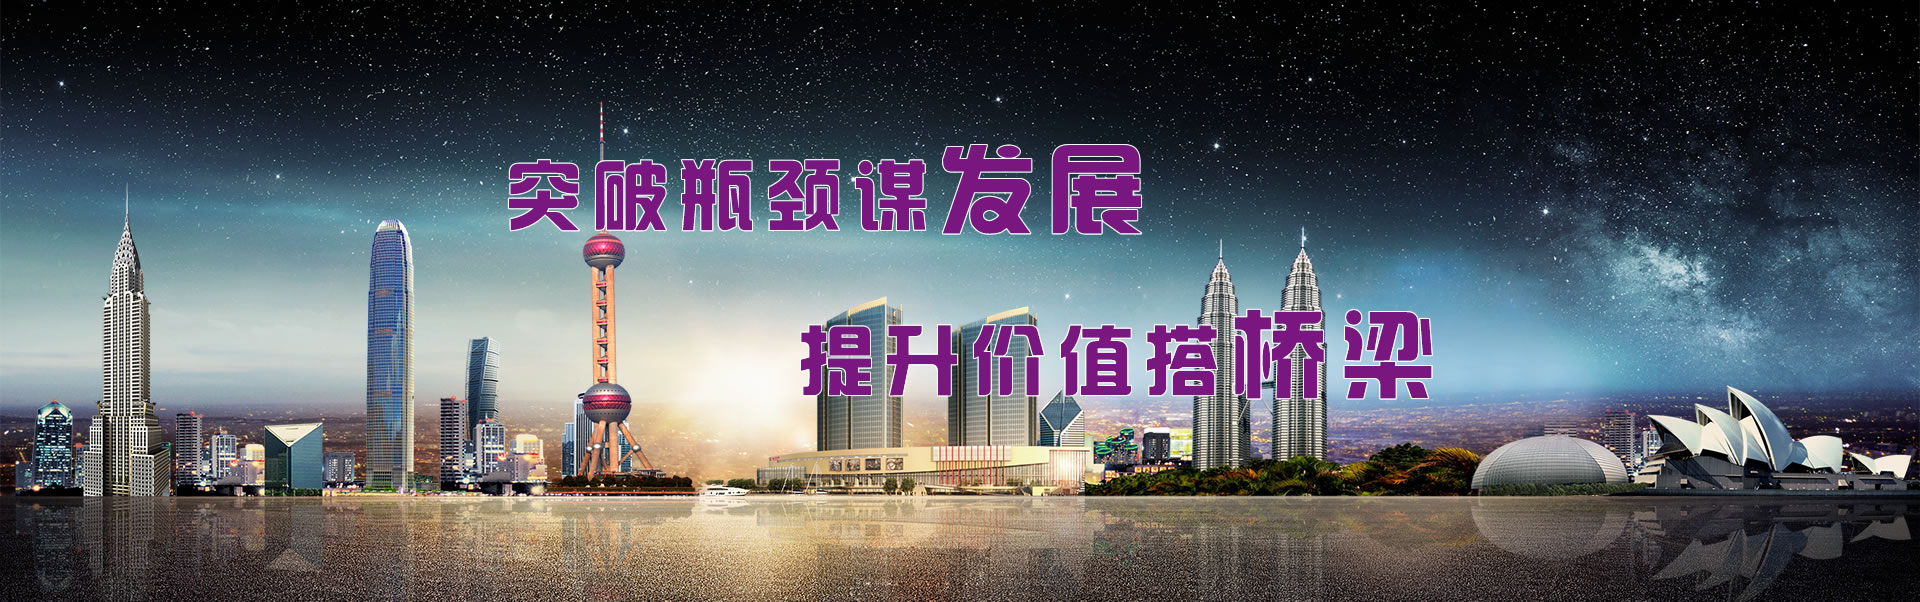 http://www.xmzxfw.cn/data/images/slide/20191020153050_224.jpg